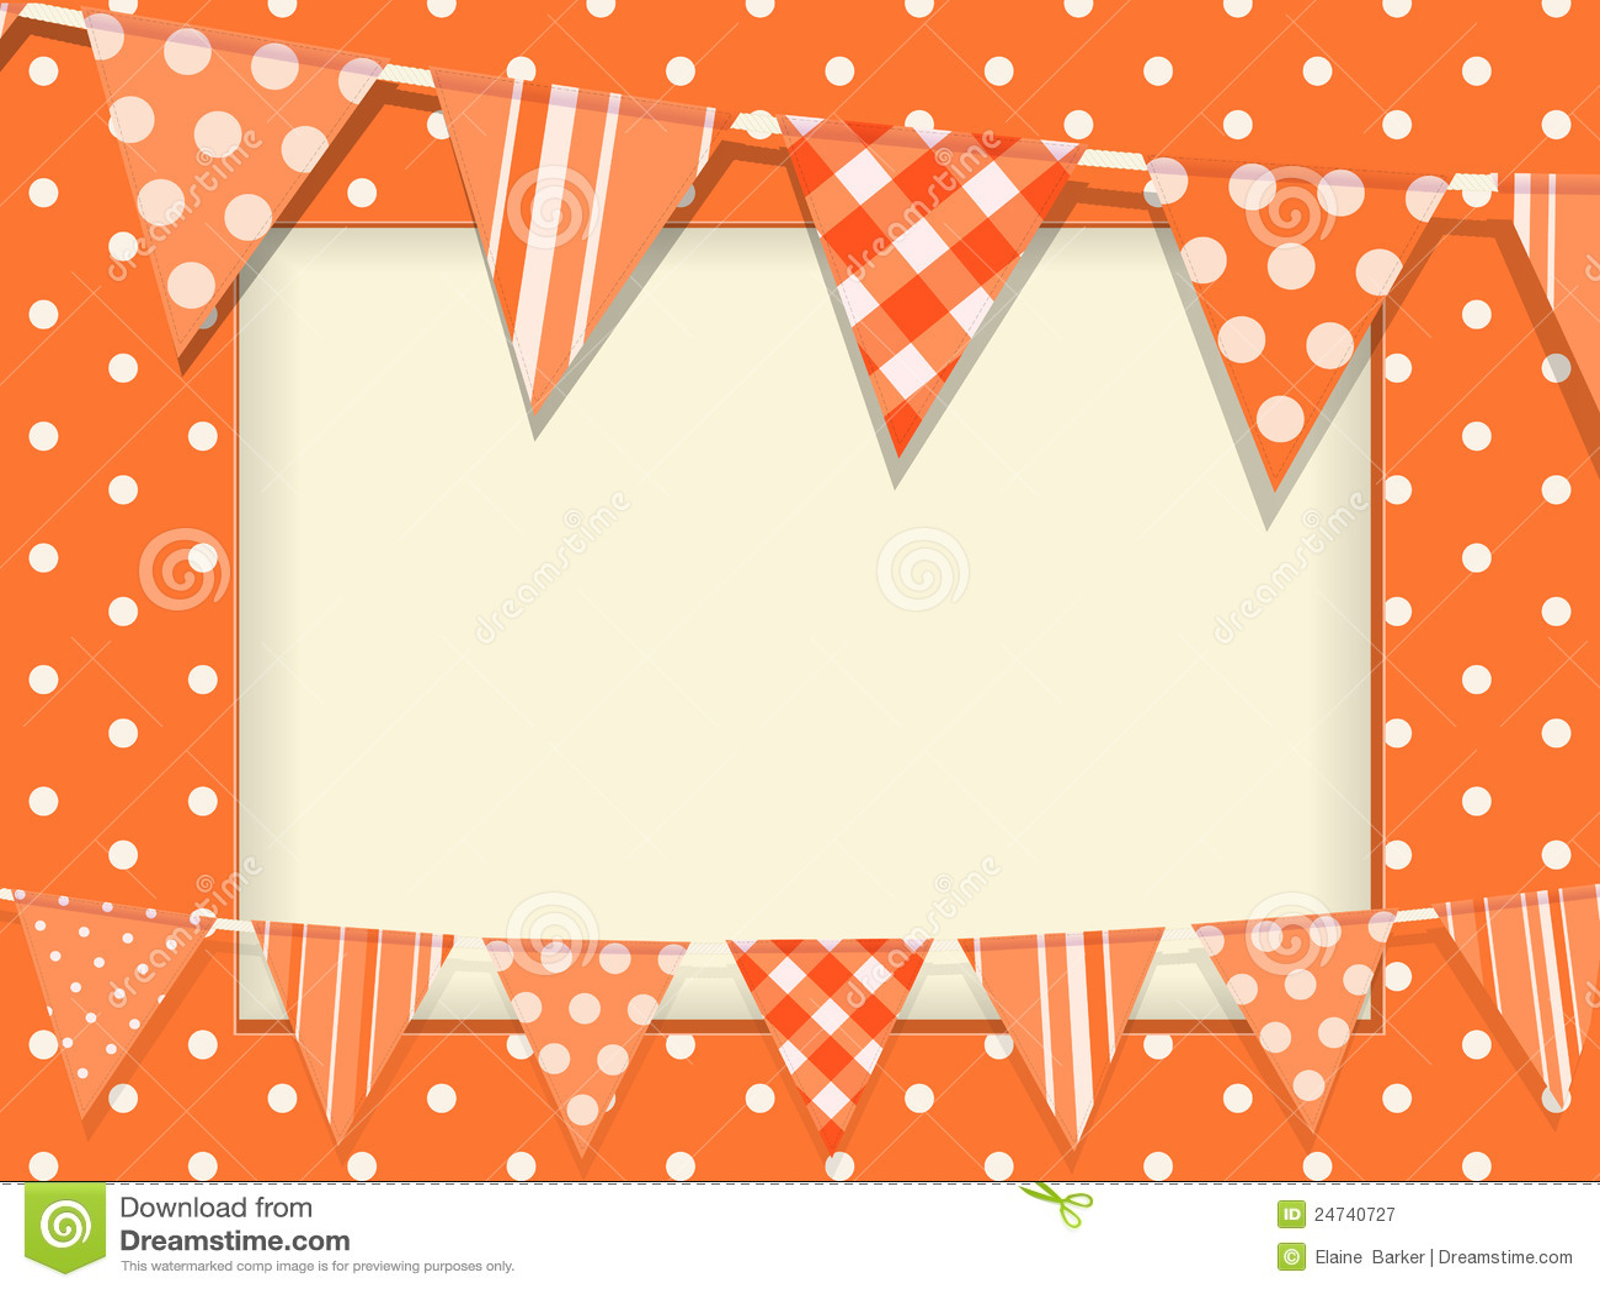 Bunting And Orange Polka Dot Frame Stock Vector - Illustration of ...